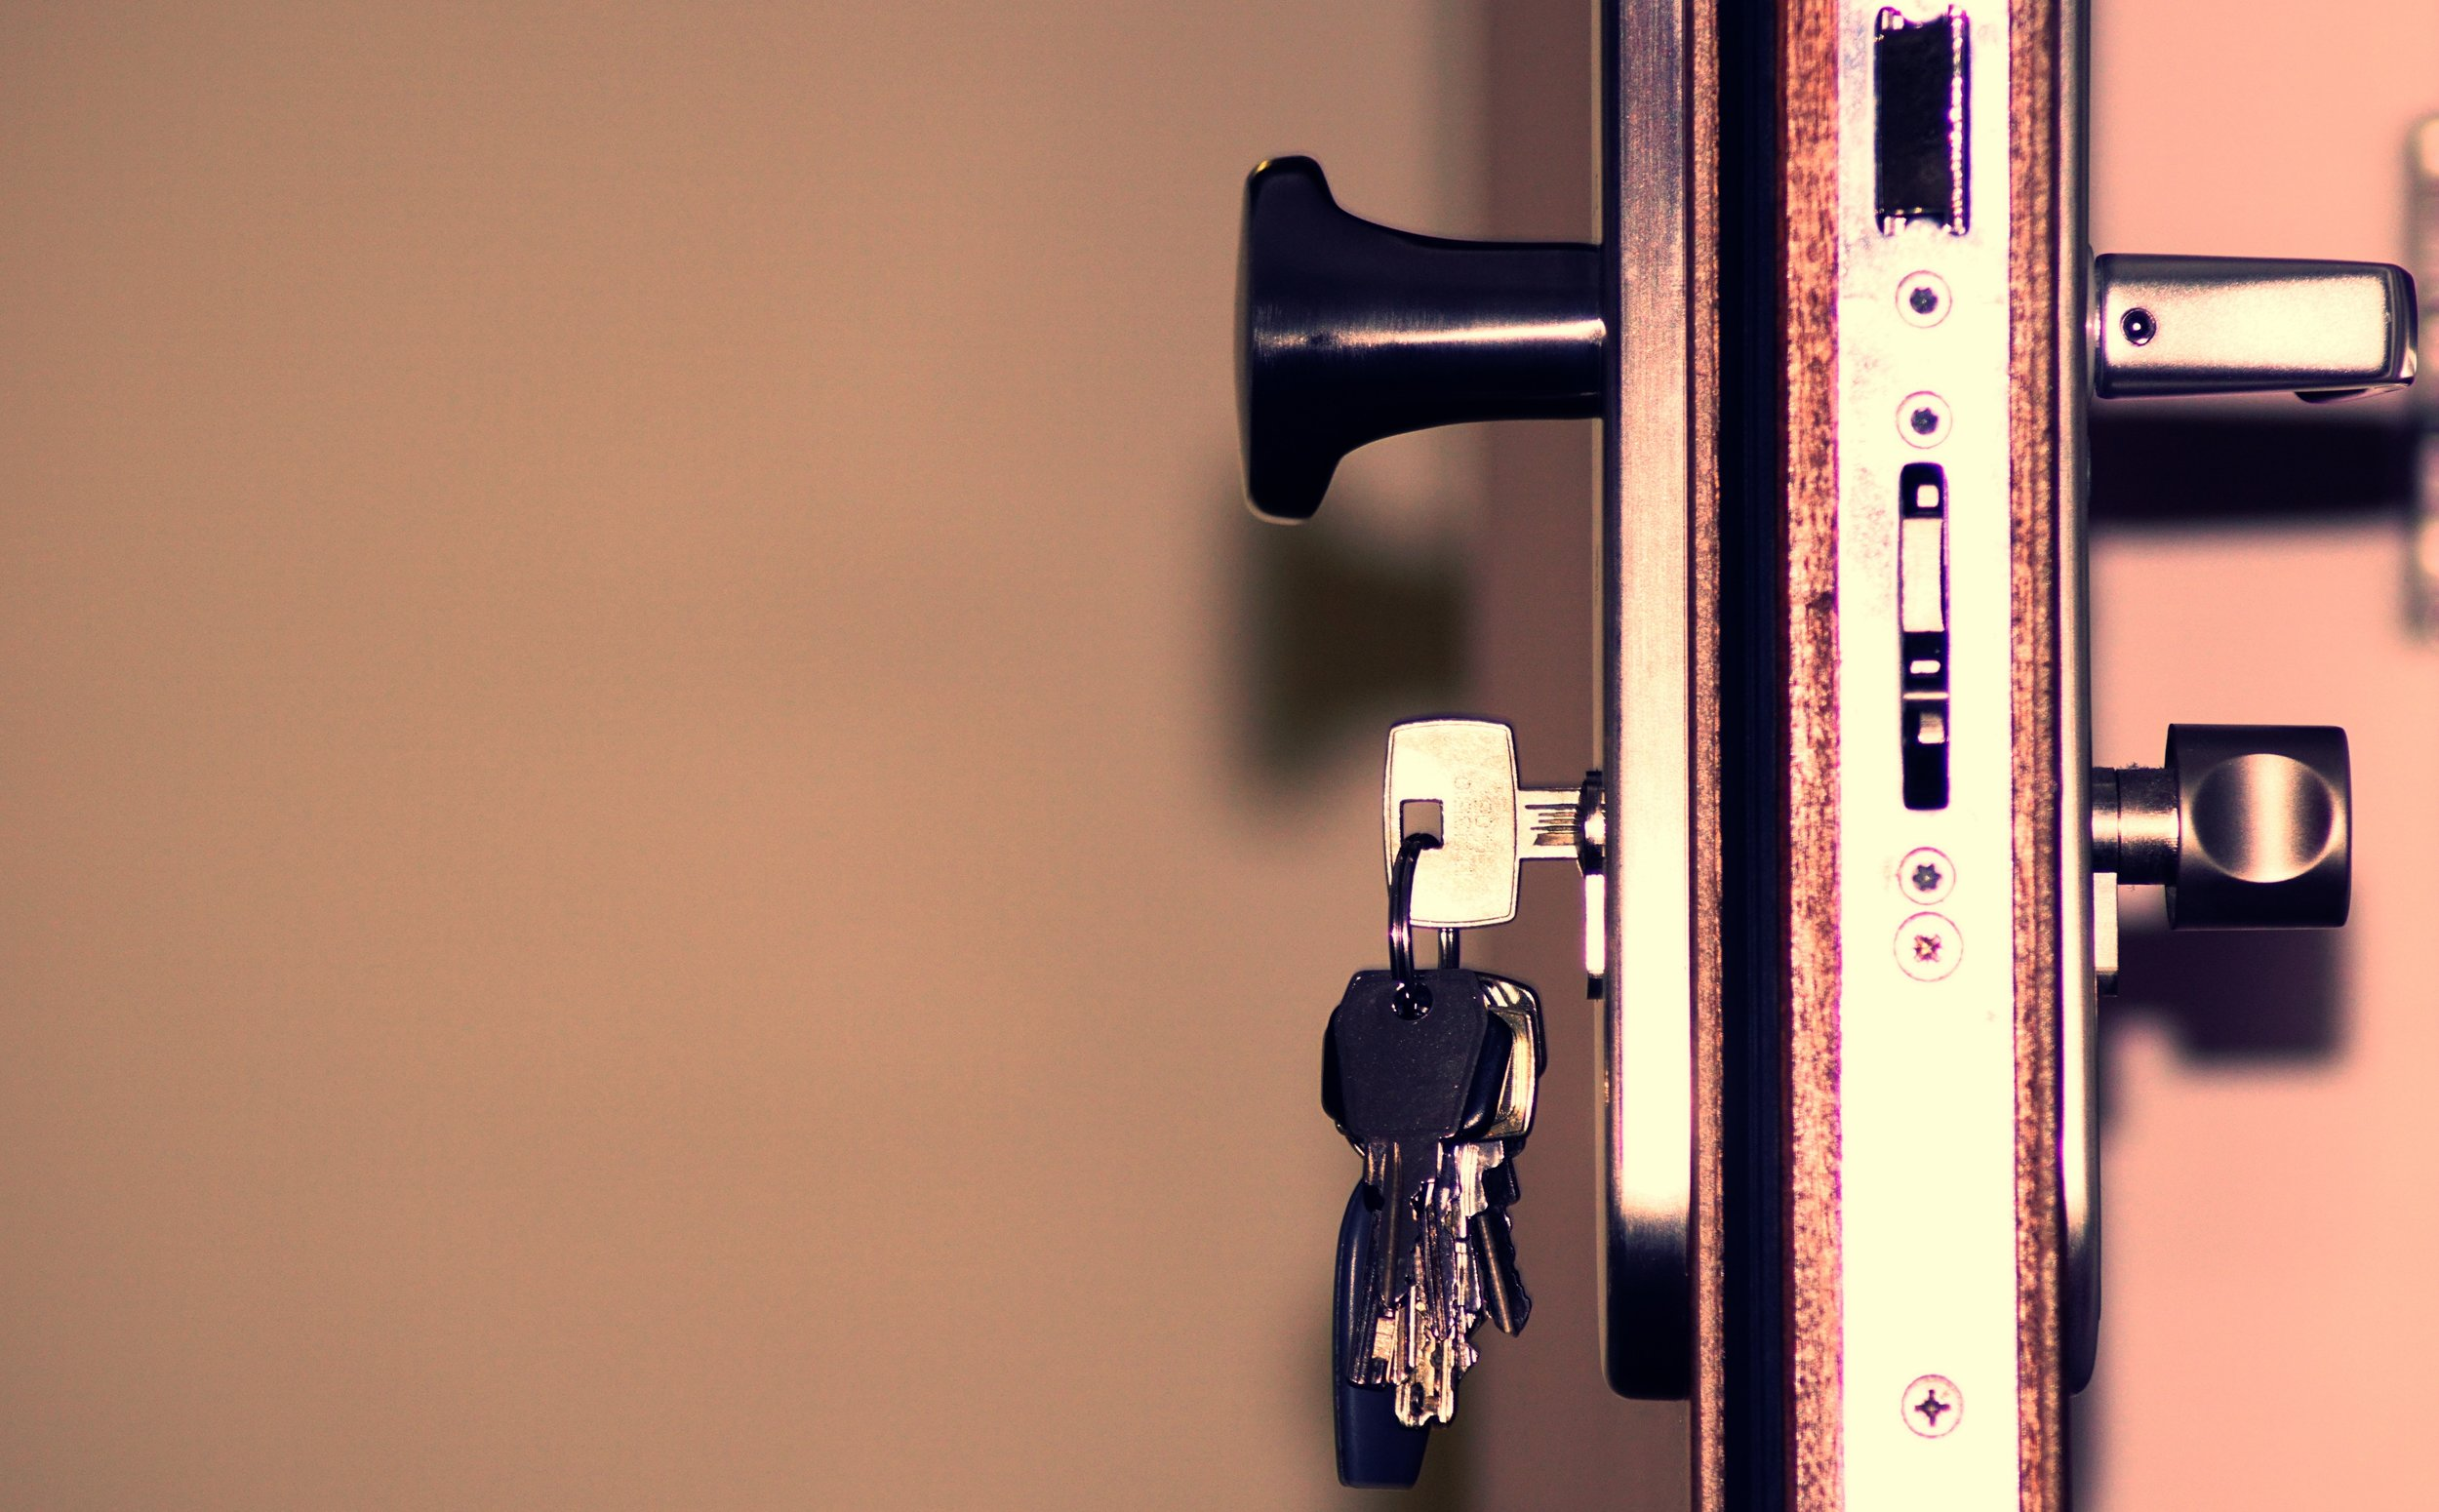 access-close-up-door-792034.jpg